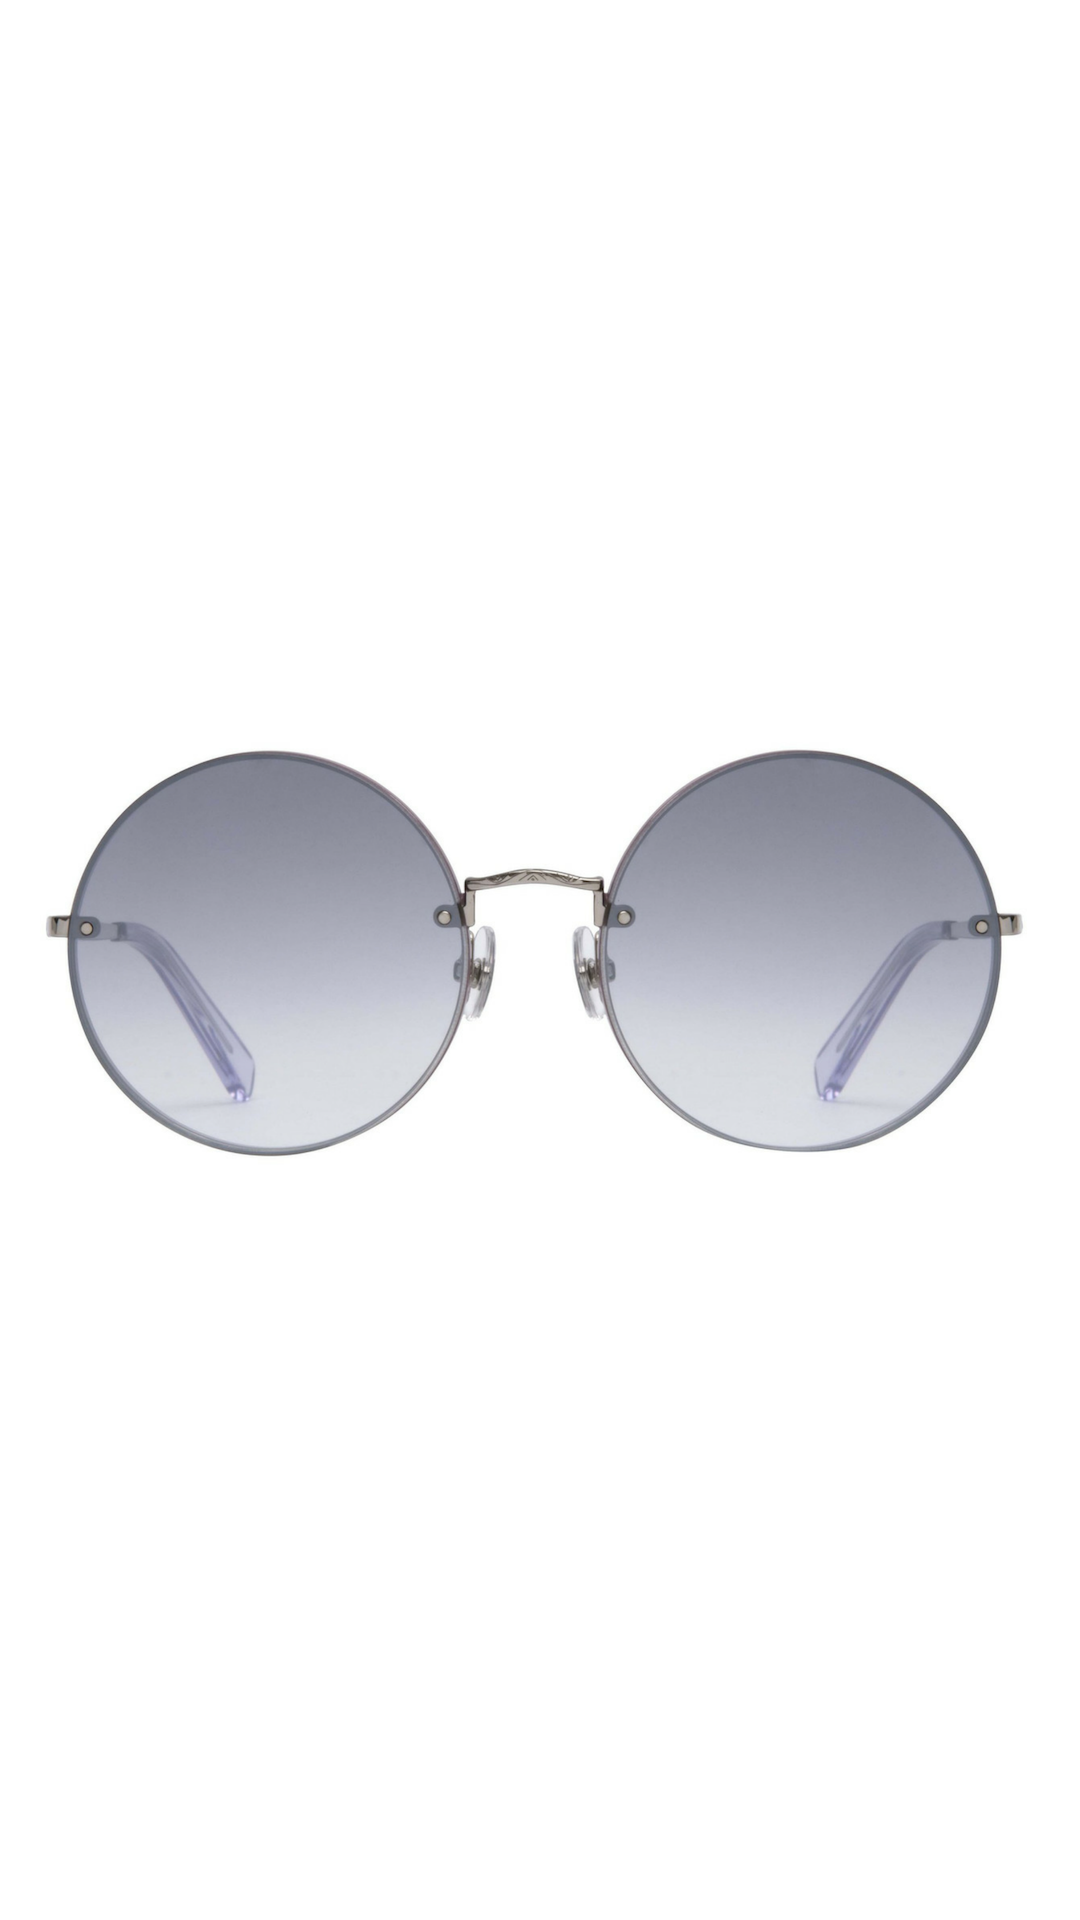 Circular Sunglasses Round Gloria Sunglasses Rebecca Minkoff Circular Sunglasses Sunglasses Circle Sunglasses